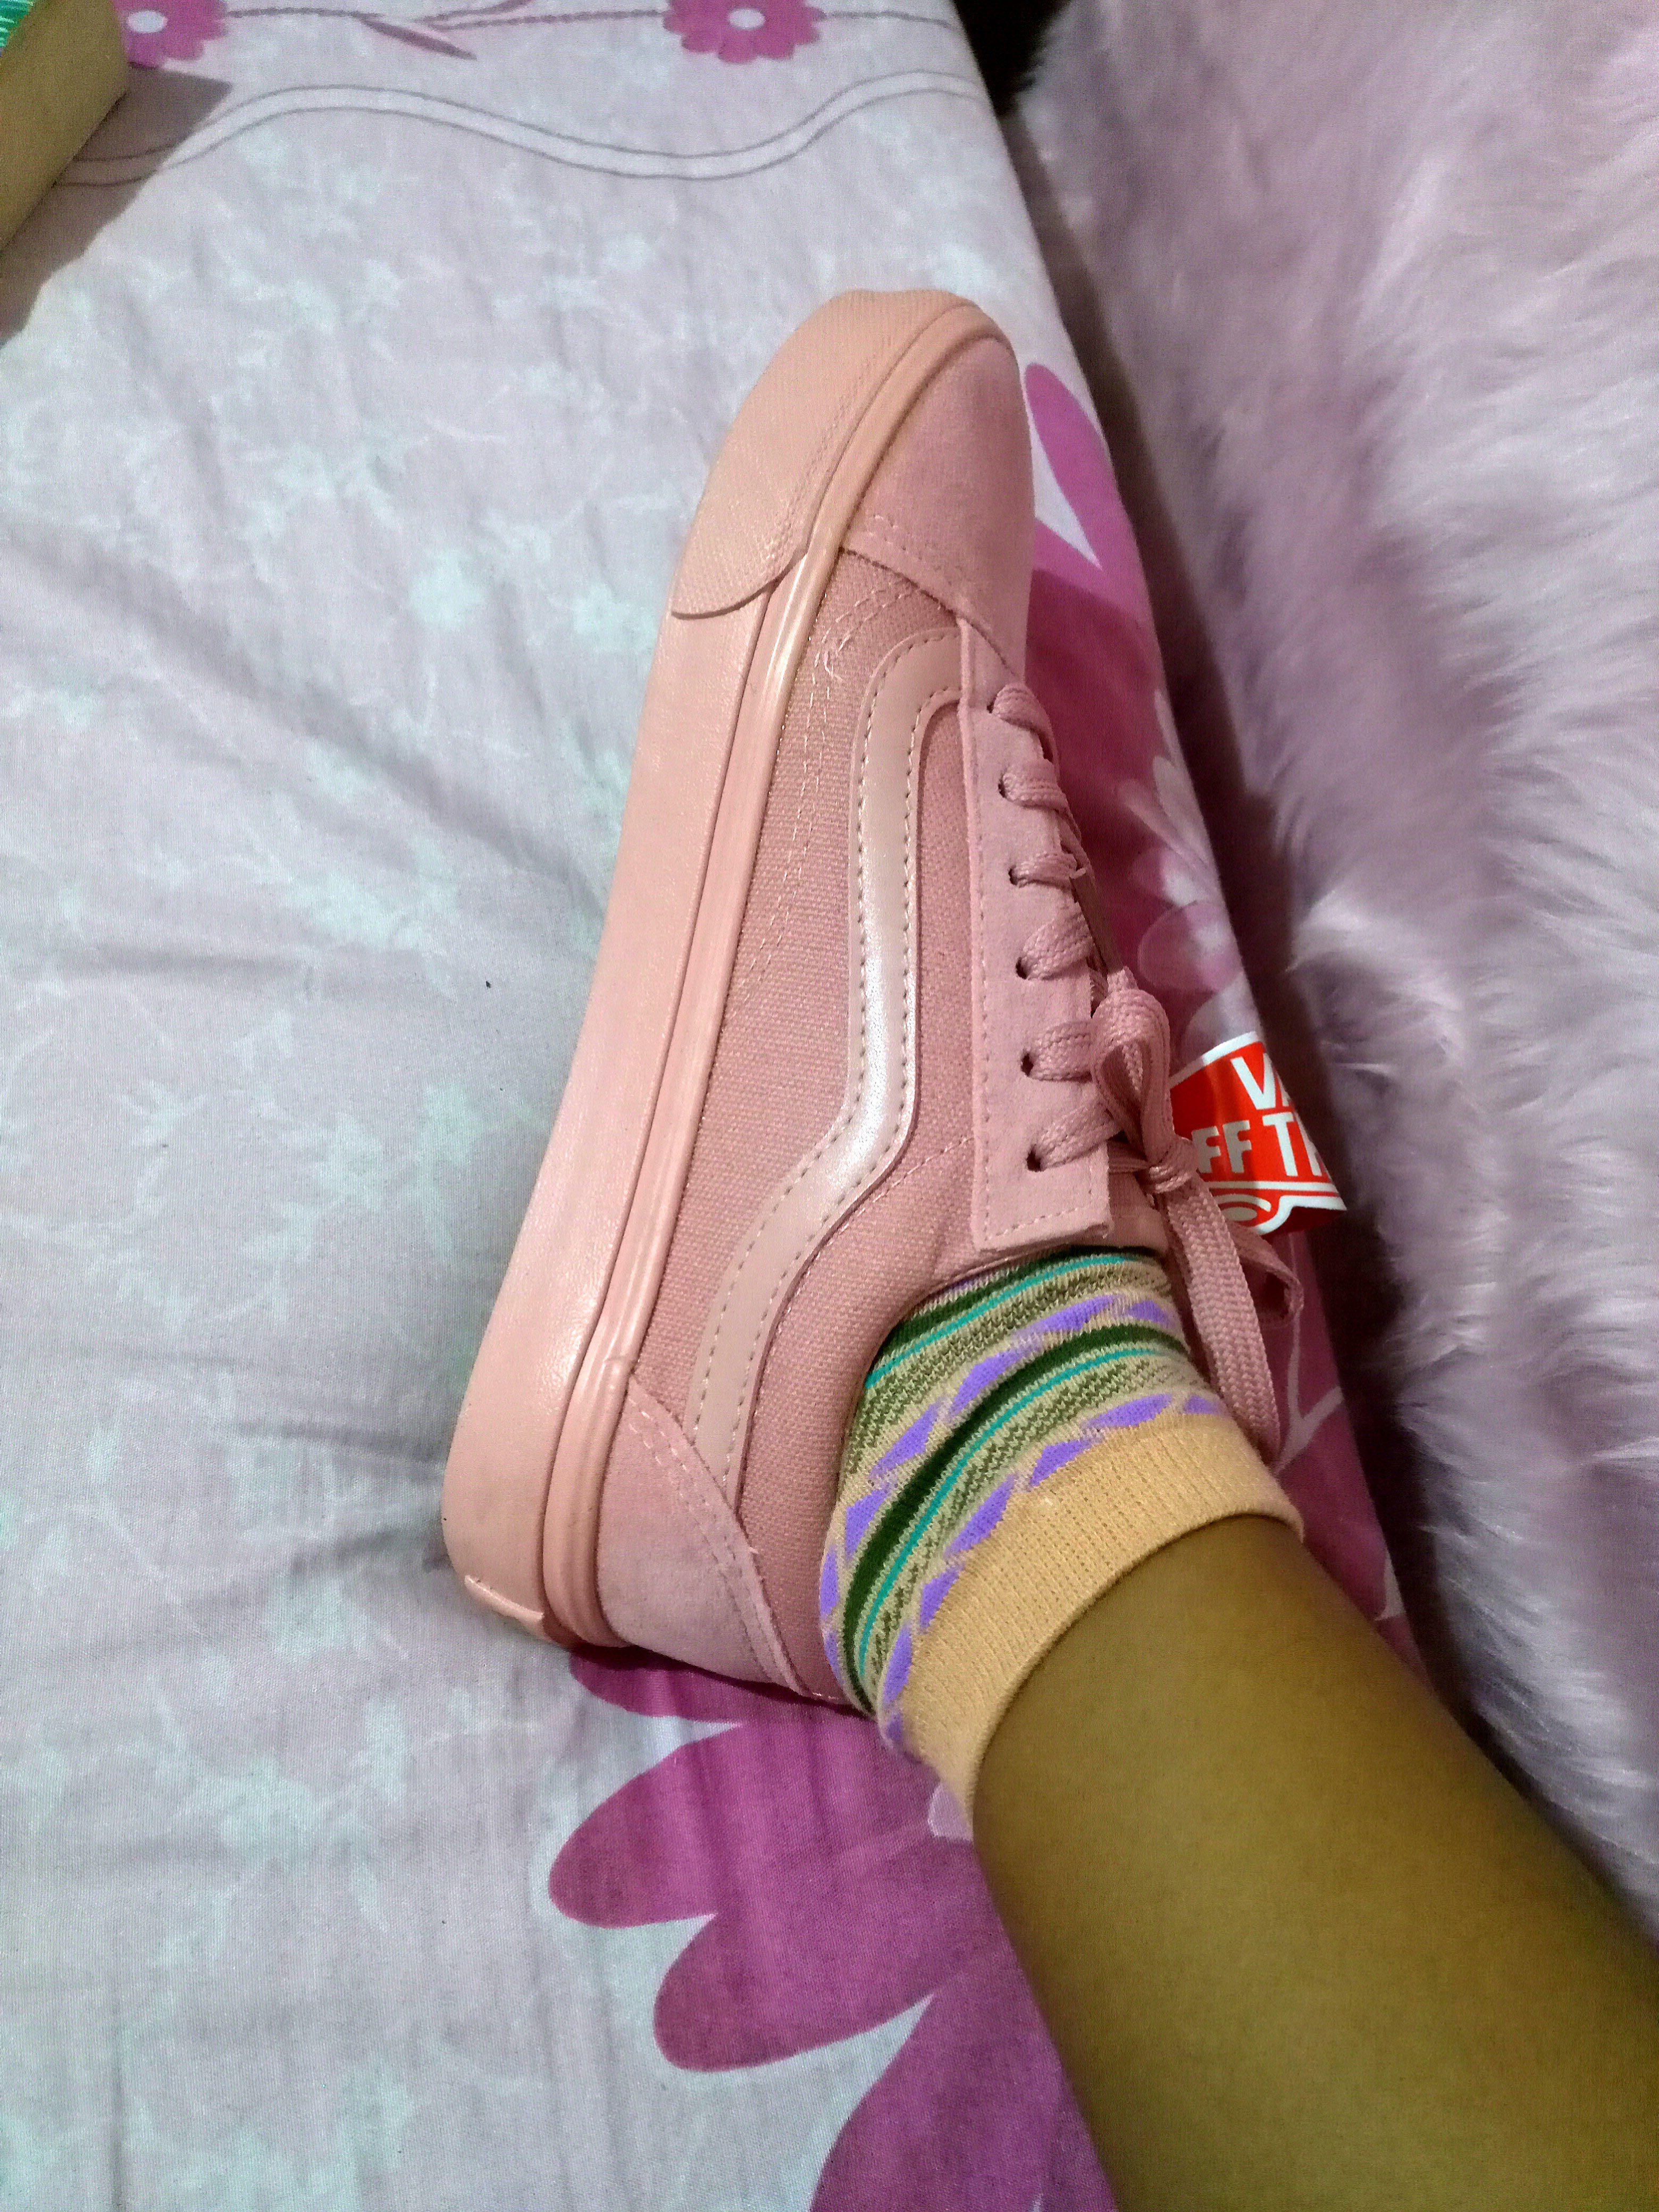 46e875bb37eda9 Home · Women s Fashion · Shoes. photo photo photo photo